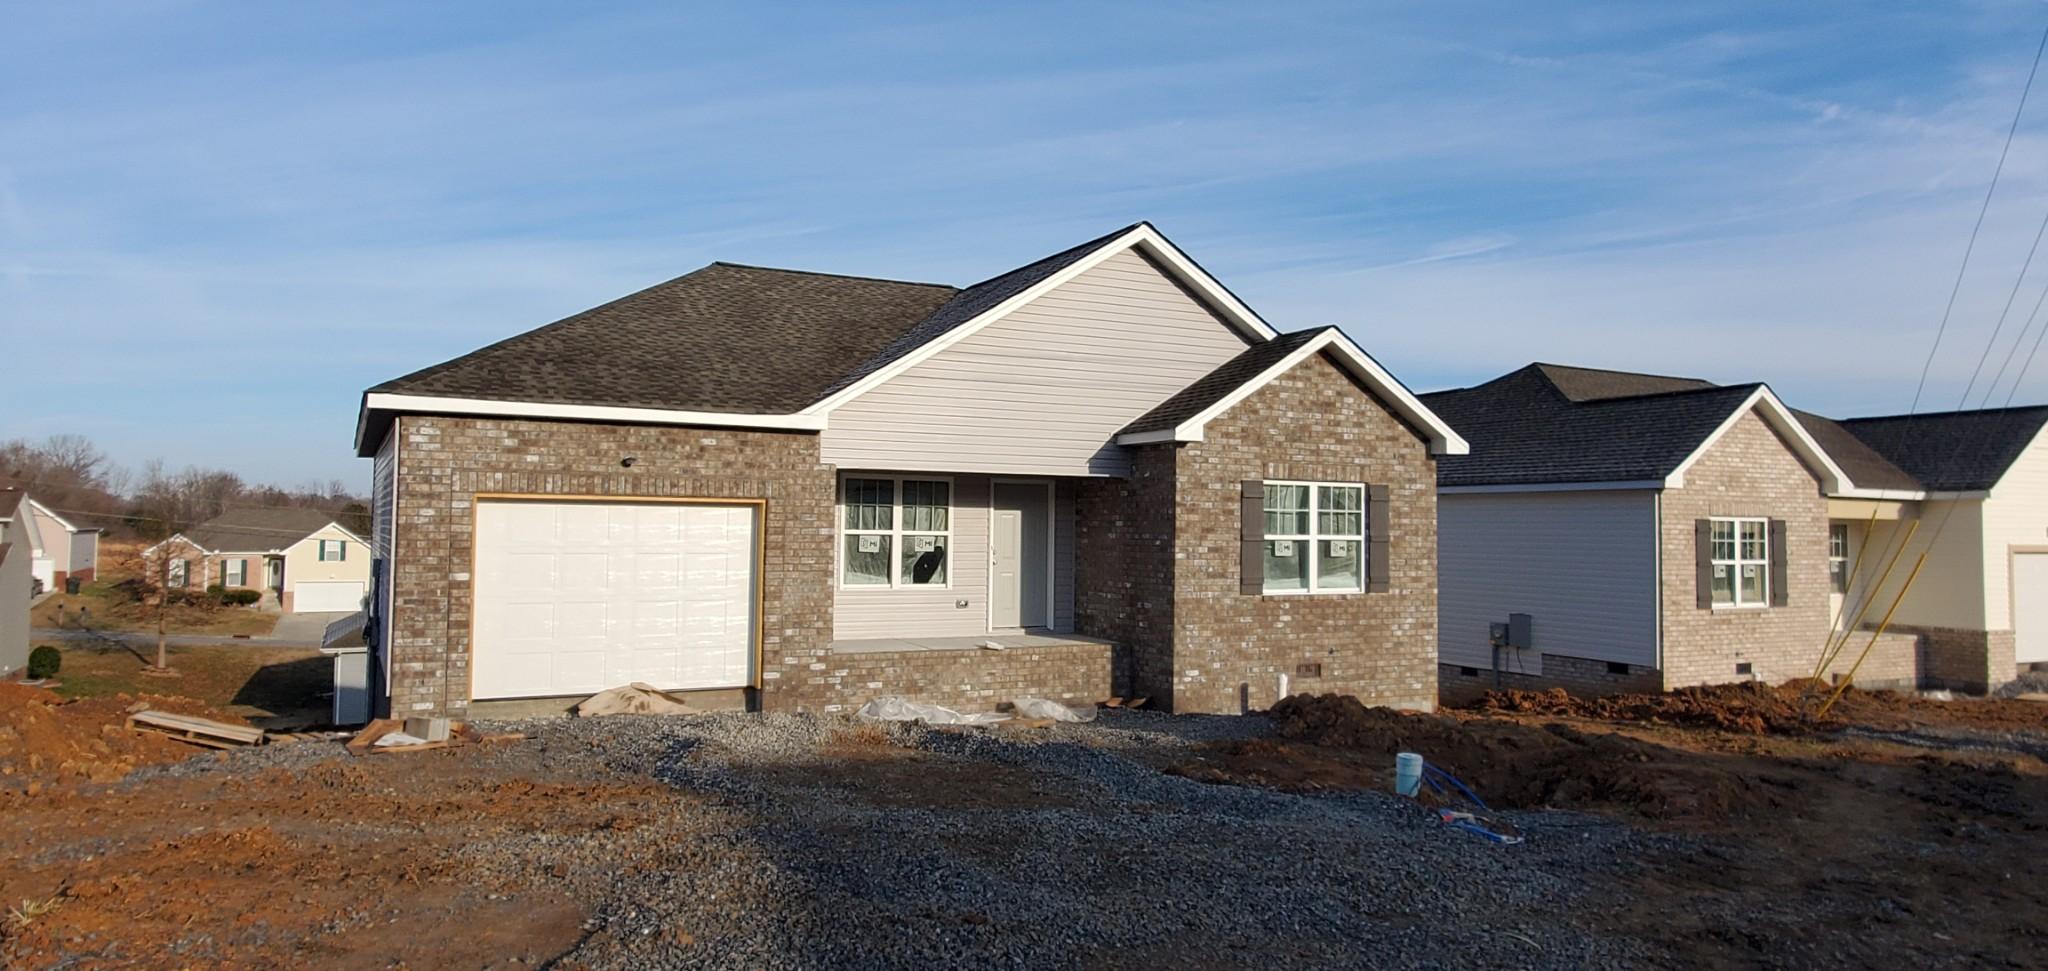 127 Sage Dr, Springfield, TN 37172 - Springfield, TN real estate listing